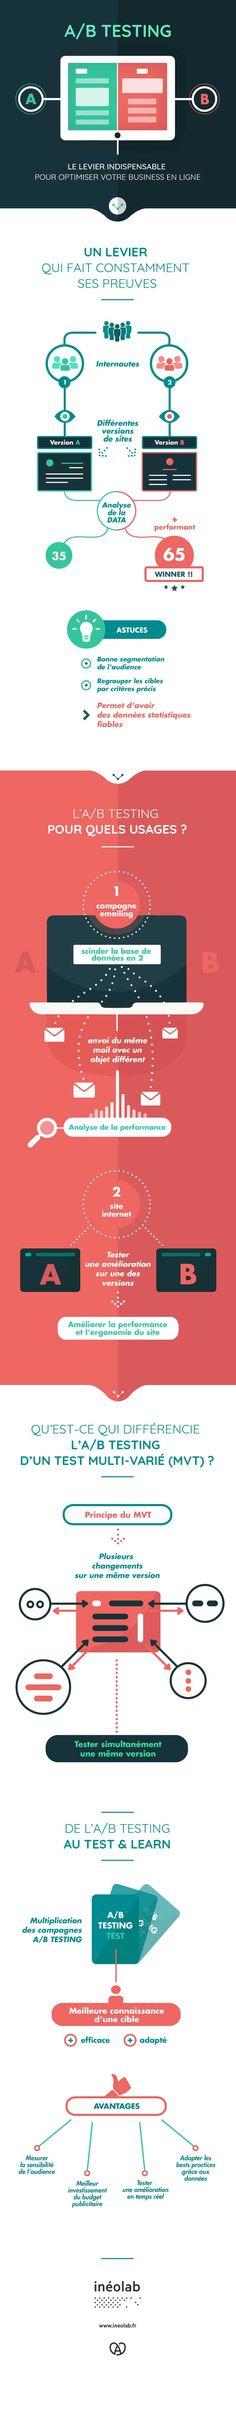 infographie-ab-testing.jpg (900×9227)